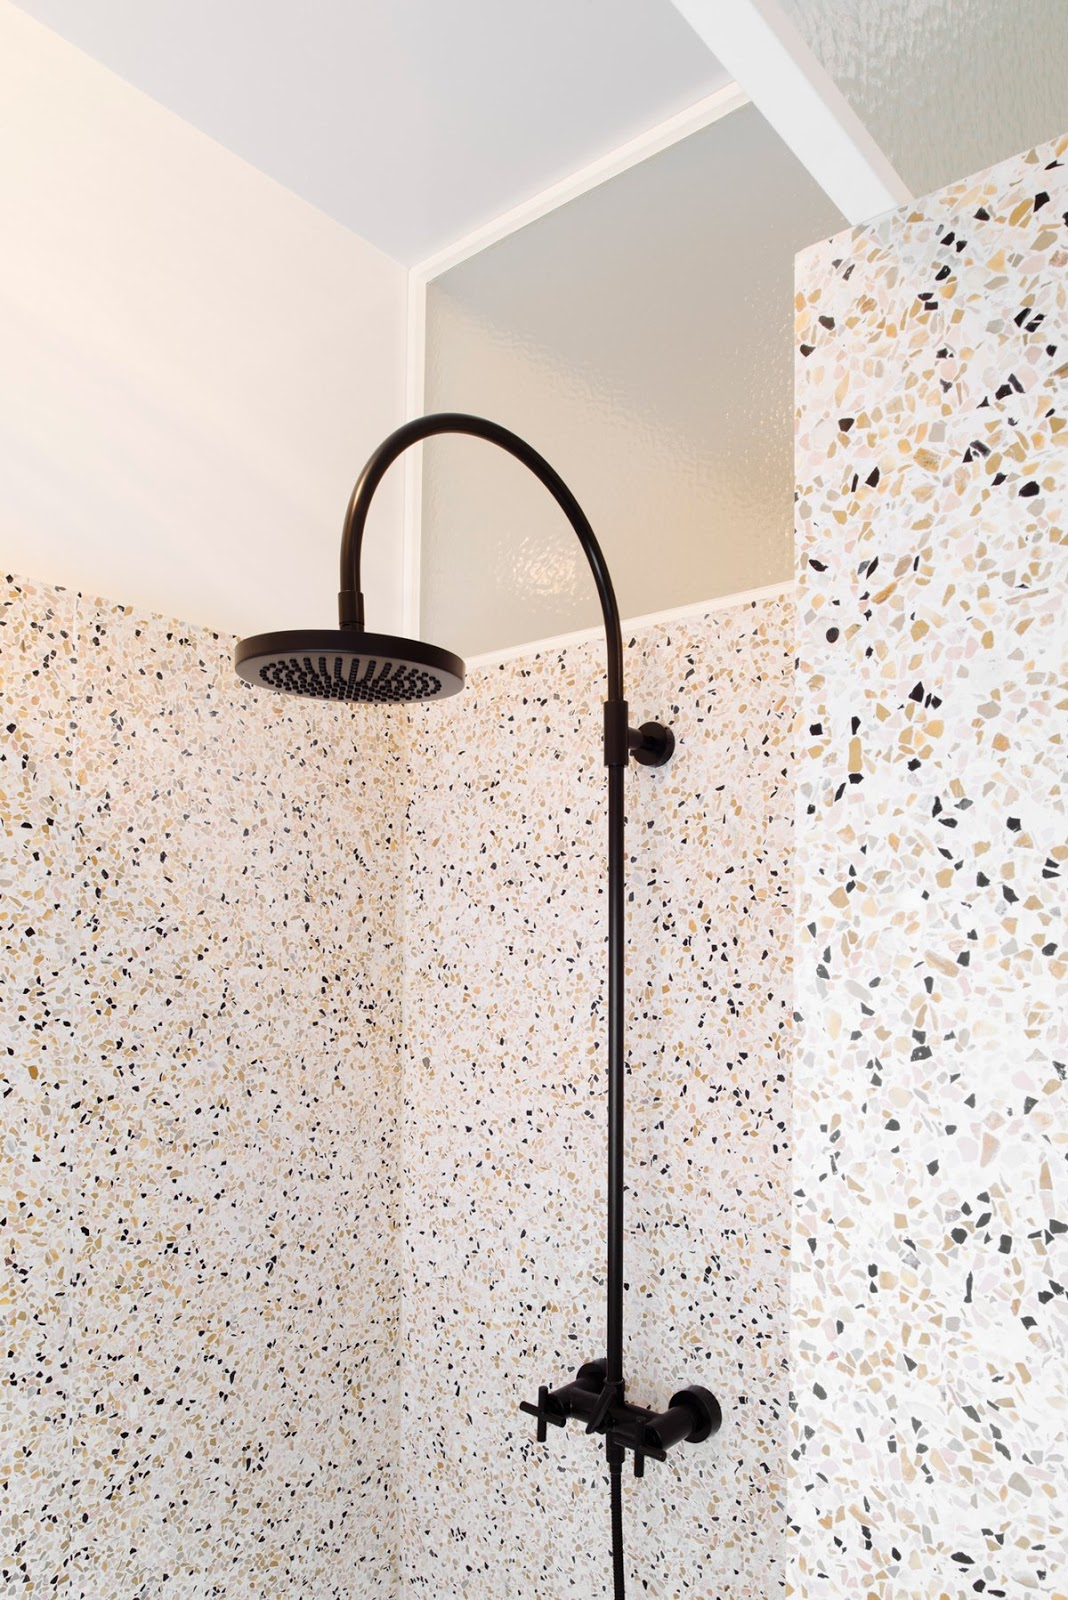 terrazzo, terrazzo flooring, terrazzo floor, terrazzo and marble, Bathroom floor tiles, Marble